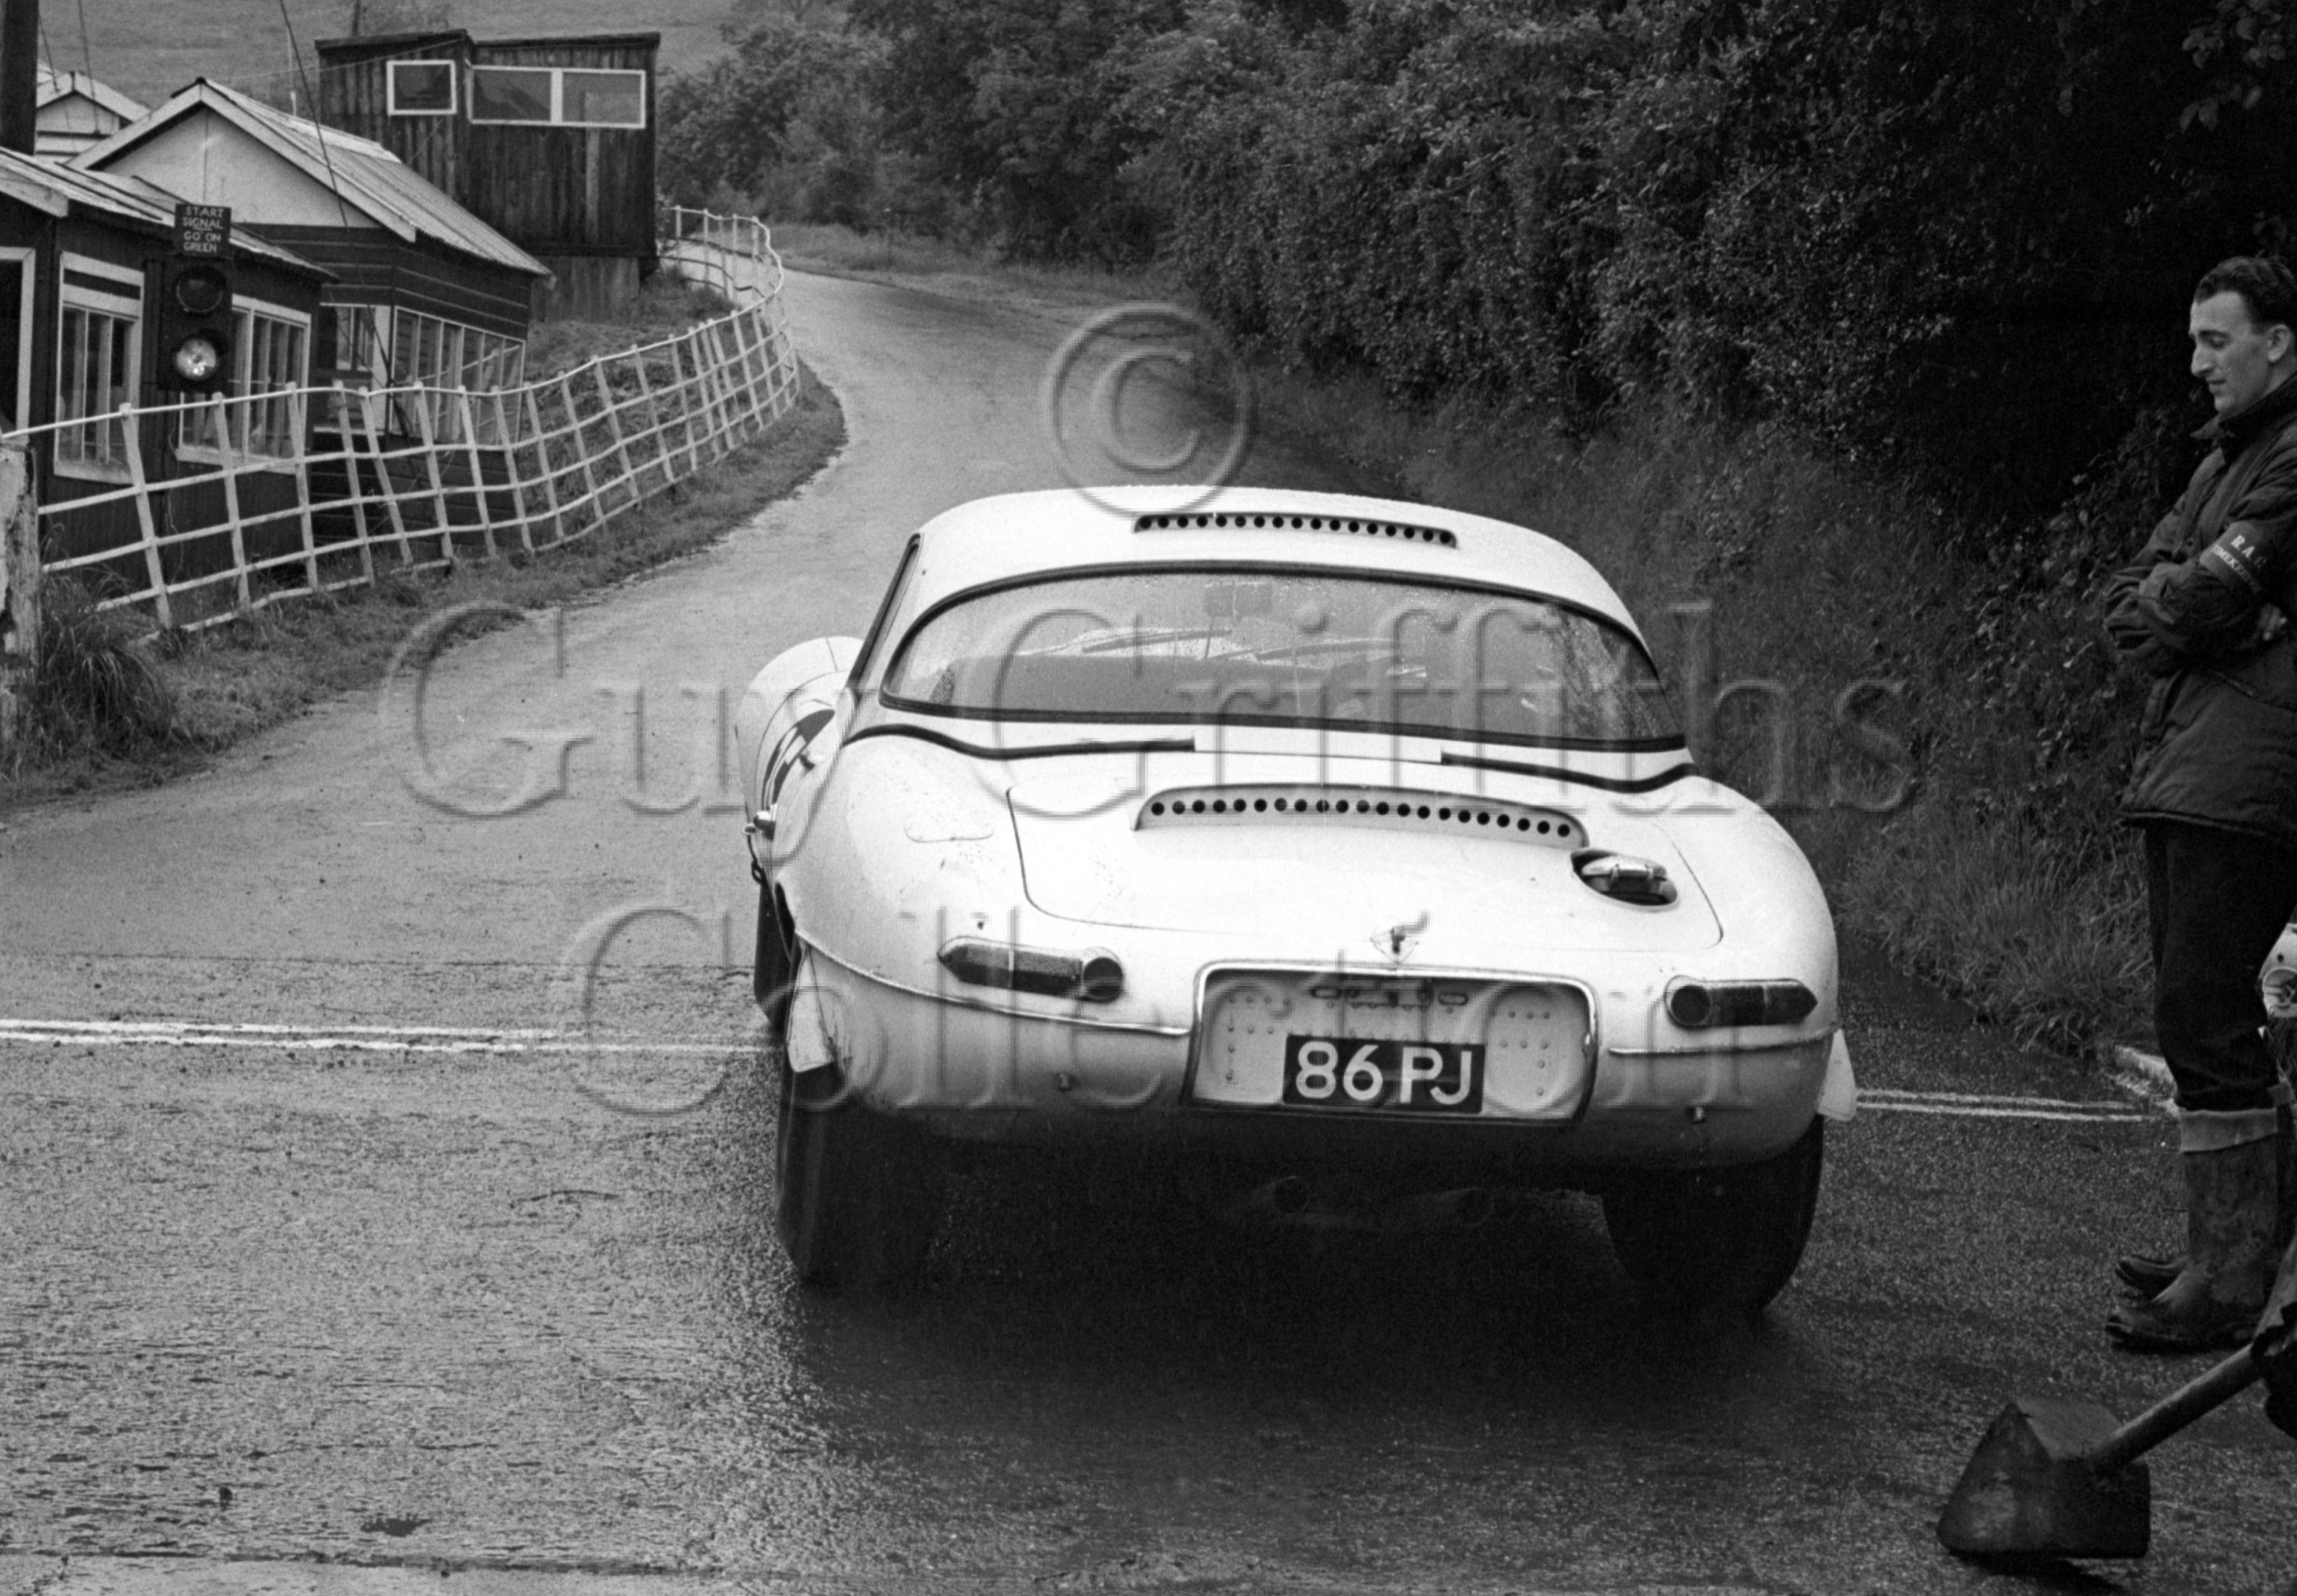 109-674–P-J-Woodley–Jaguar-E-Type-86-PJ–Shelsley-Wash–14-07-1968.jpg - Guy Griffiths Collection